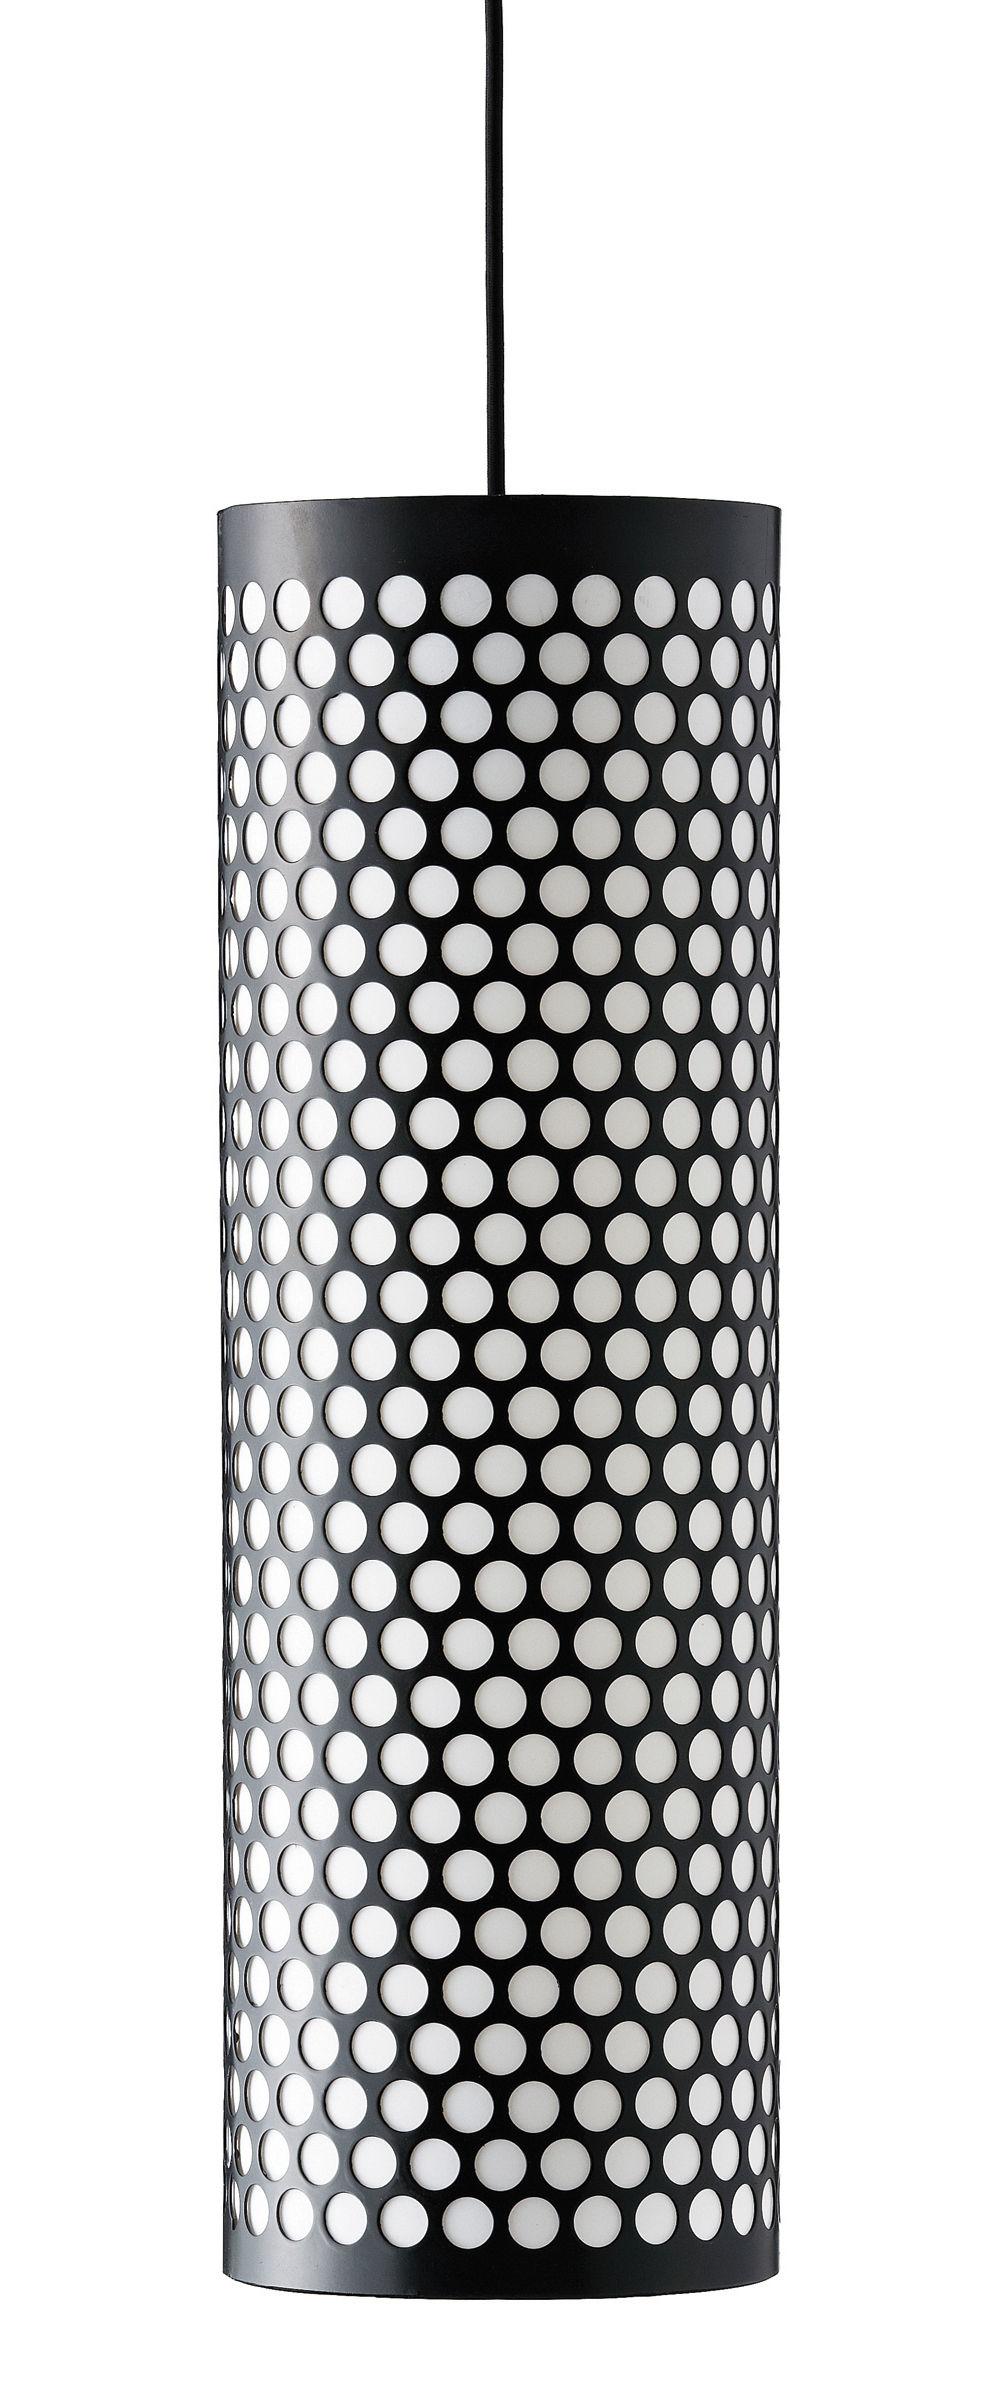 Illuminazione - Lampadari - Sospensione Pedrera ANA - Ø 20 x H 63 cm di Gubi - Nero - Metallo, Polietilene